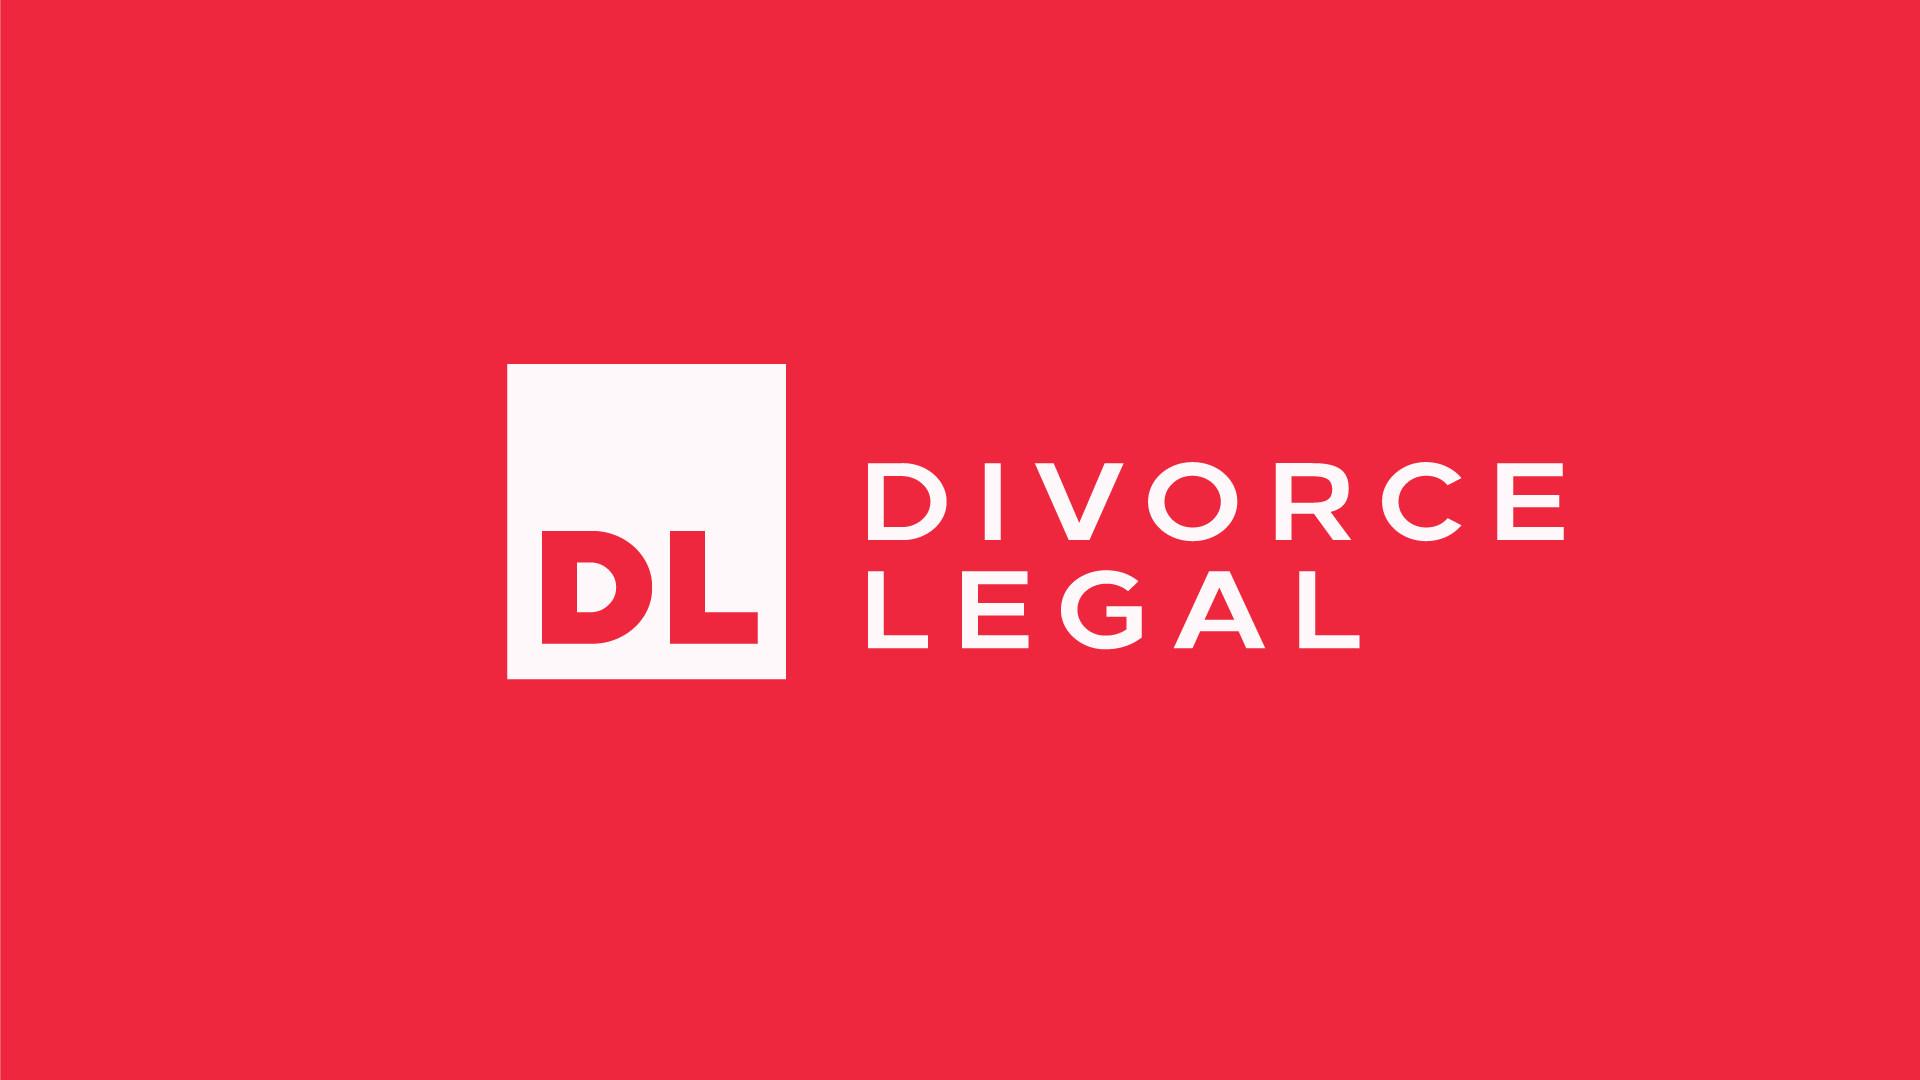 Divorce-legal-logo20-red.jpg